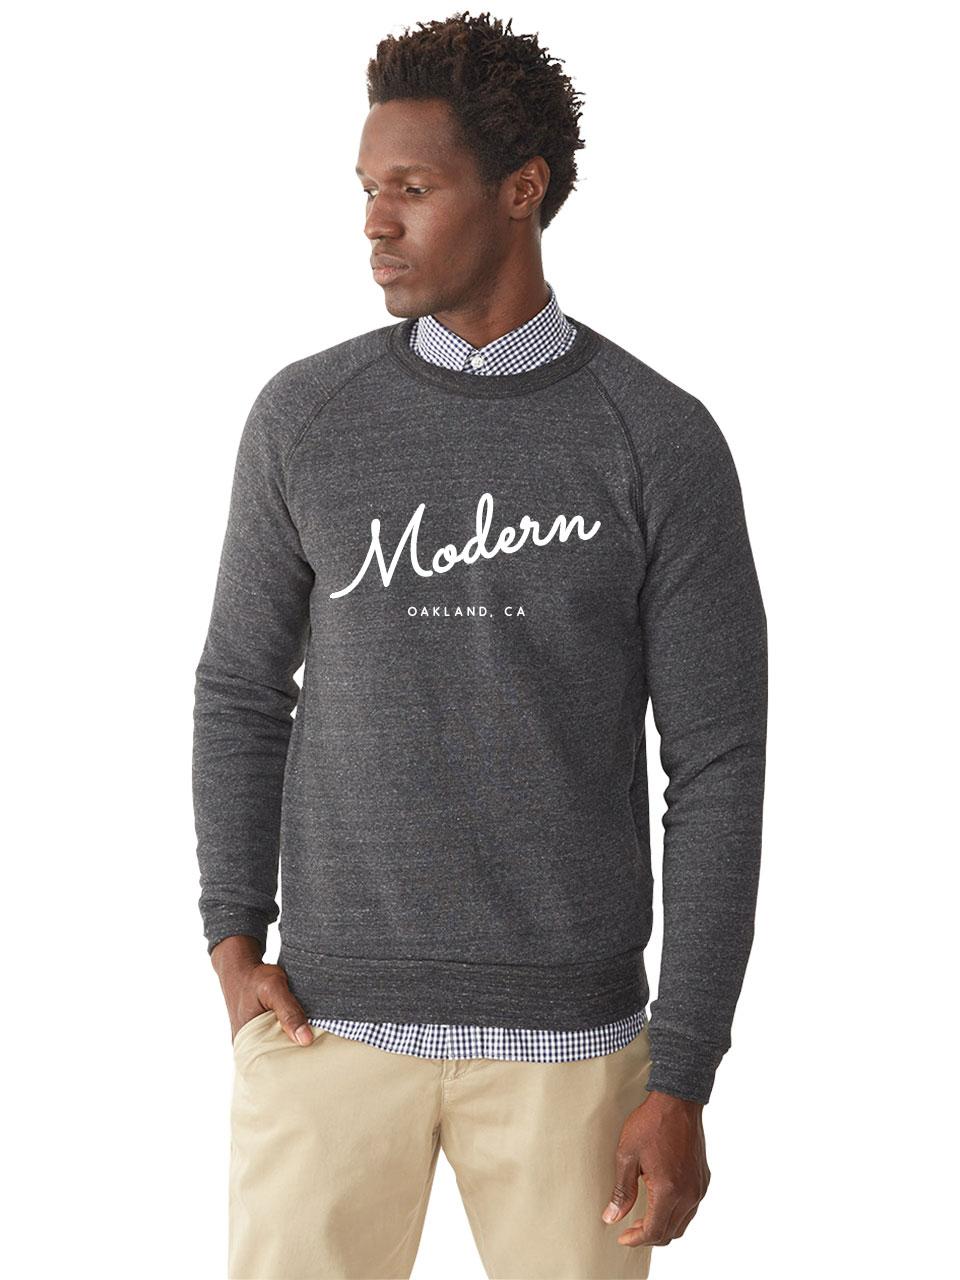 sweatshirt_mockup-R3-C-white